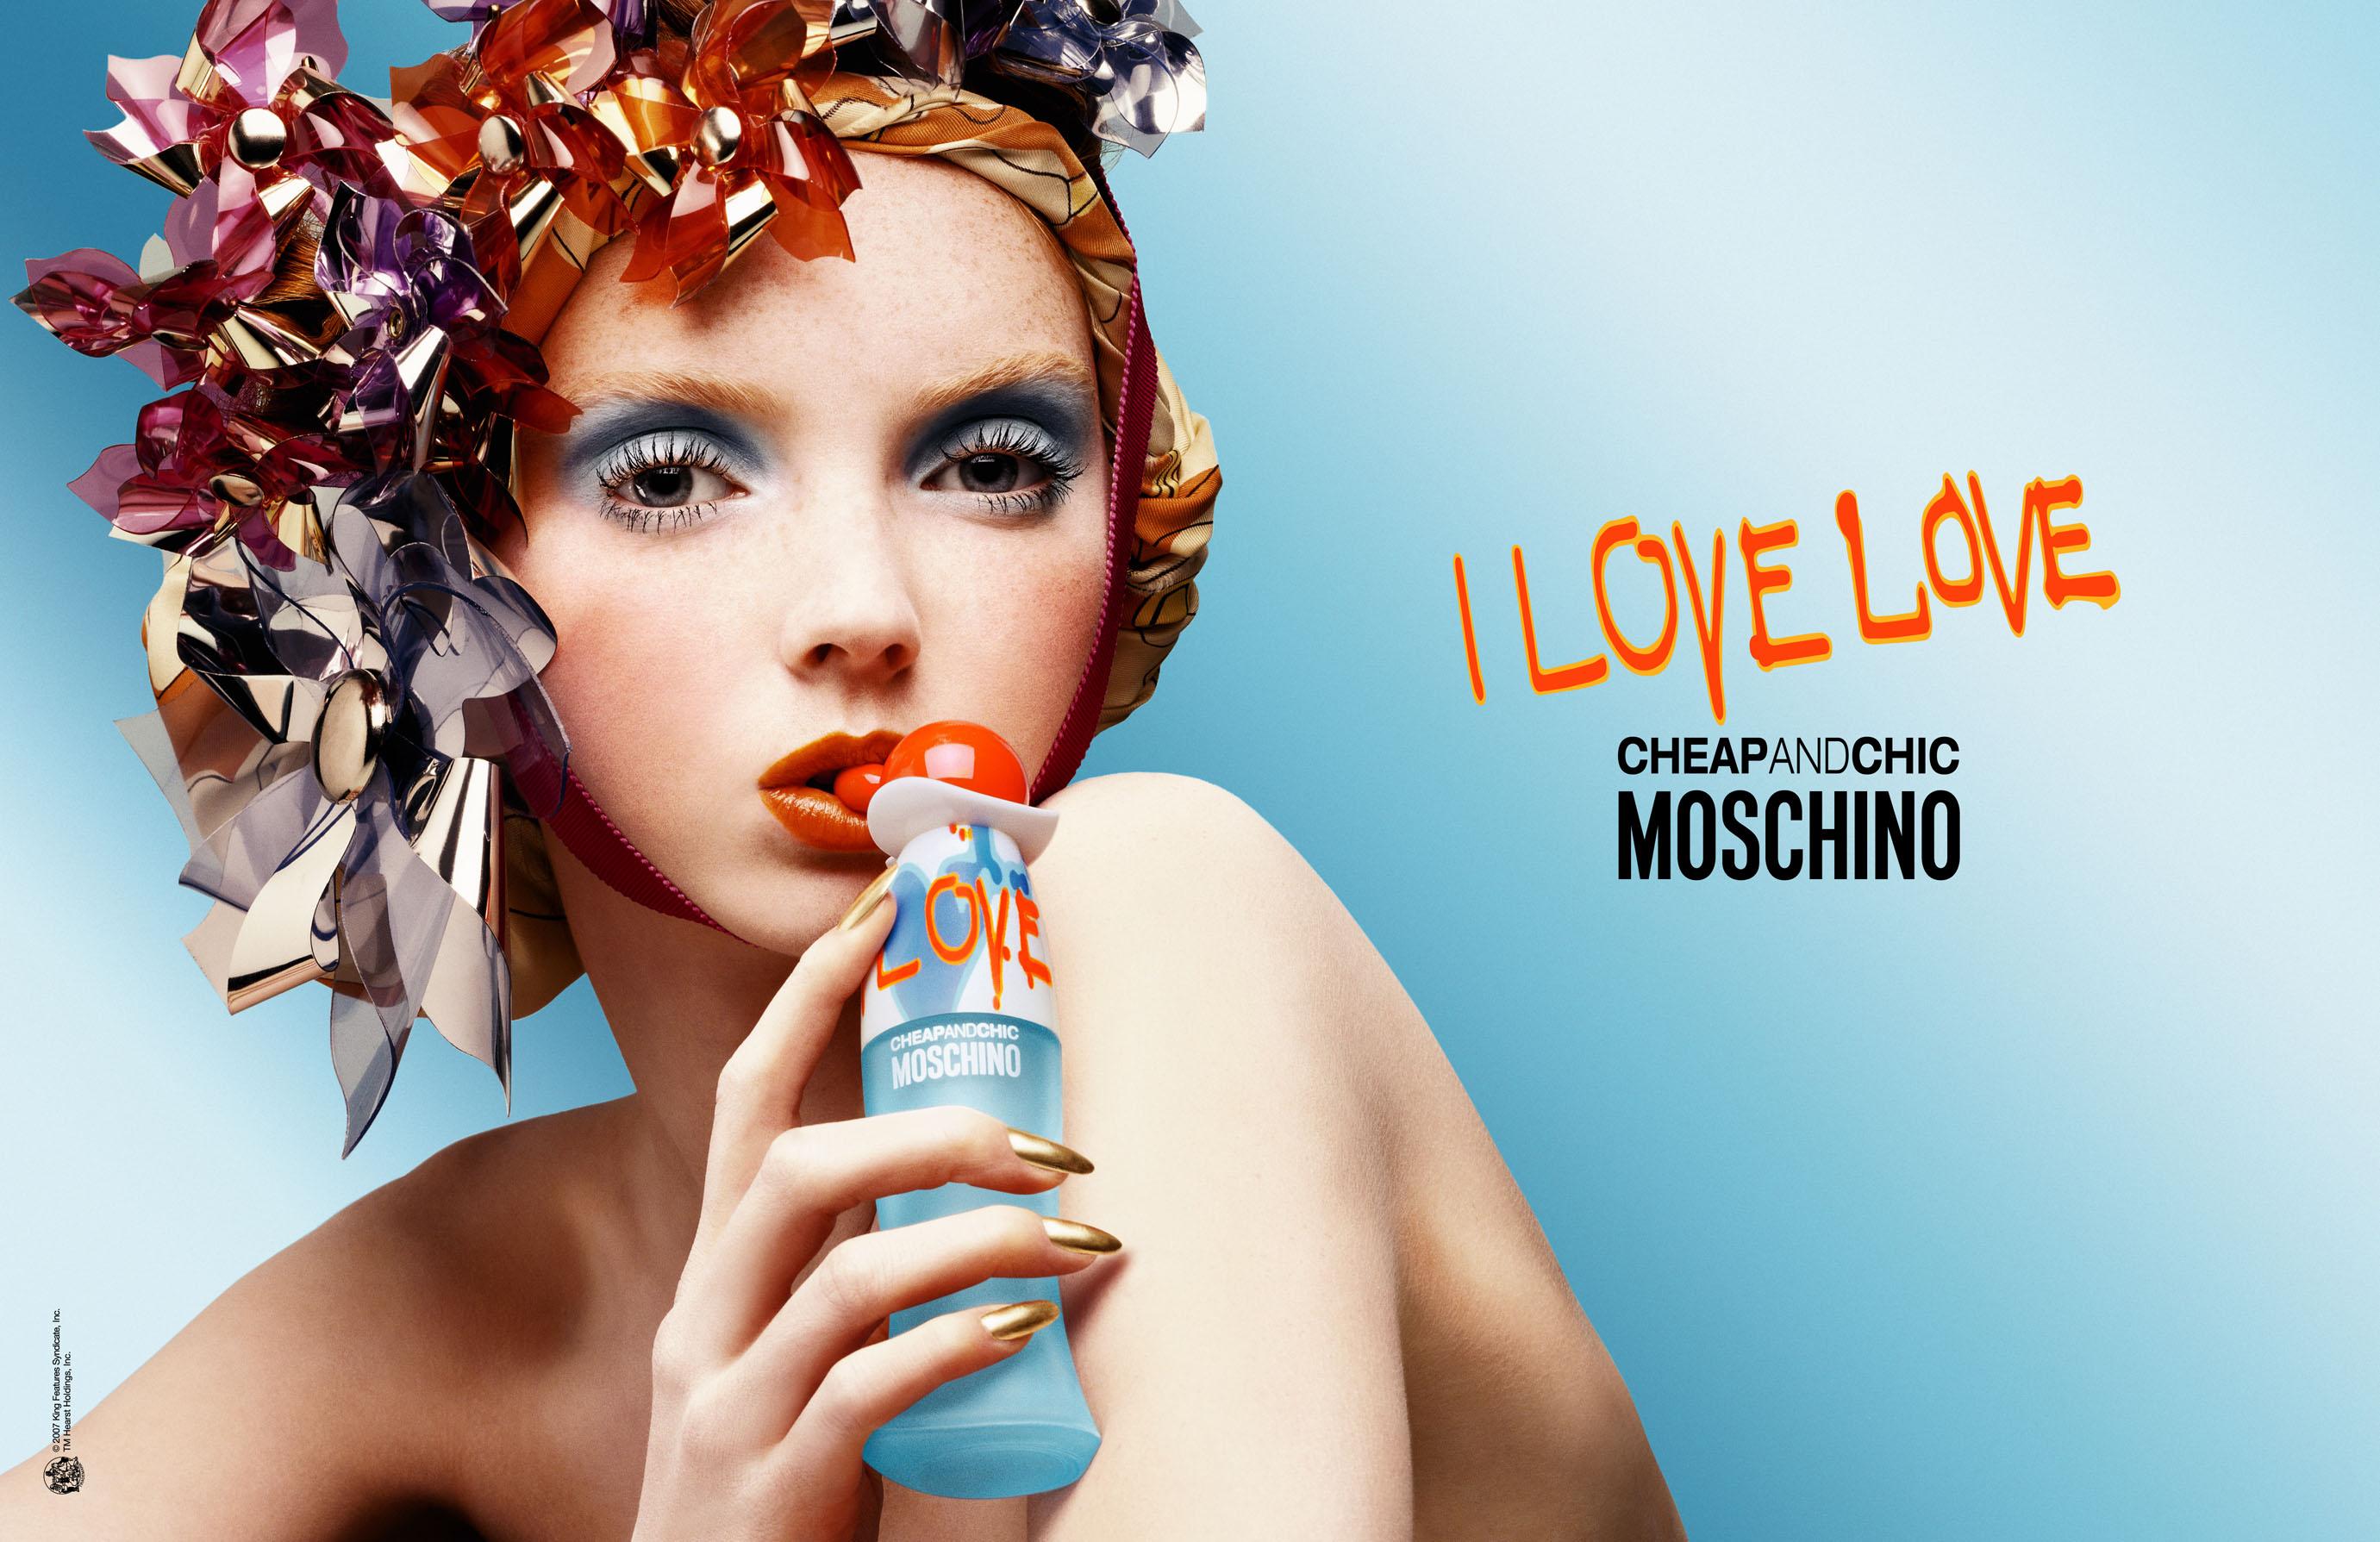 moschino love love perfumer notas olfaativas